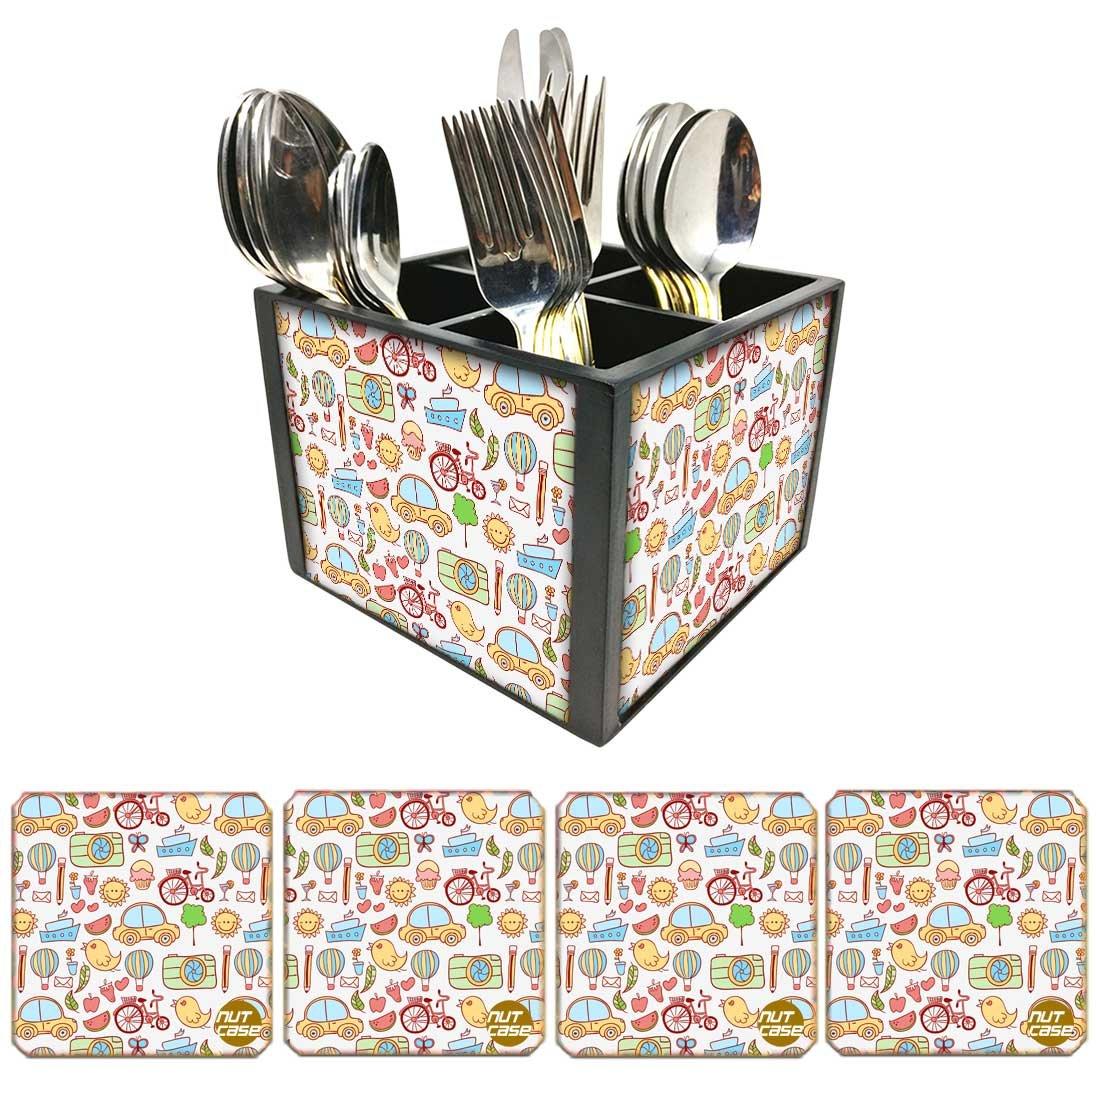 Nutcase Designer FlatwareカトラリースタンドホルダーSilverware caddy-spoonsフォークナイフOrganizer with Matchingメタルコースター – Doodle Art   B07DC817GH